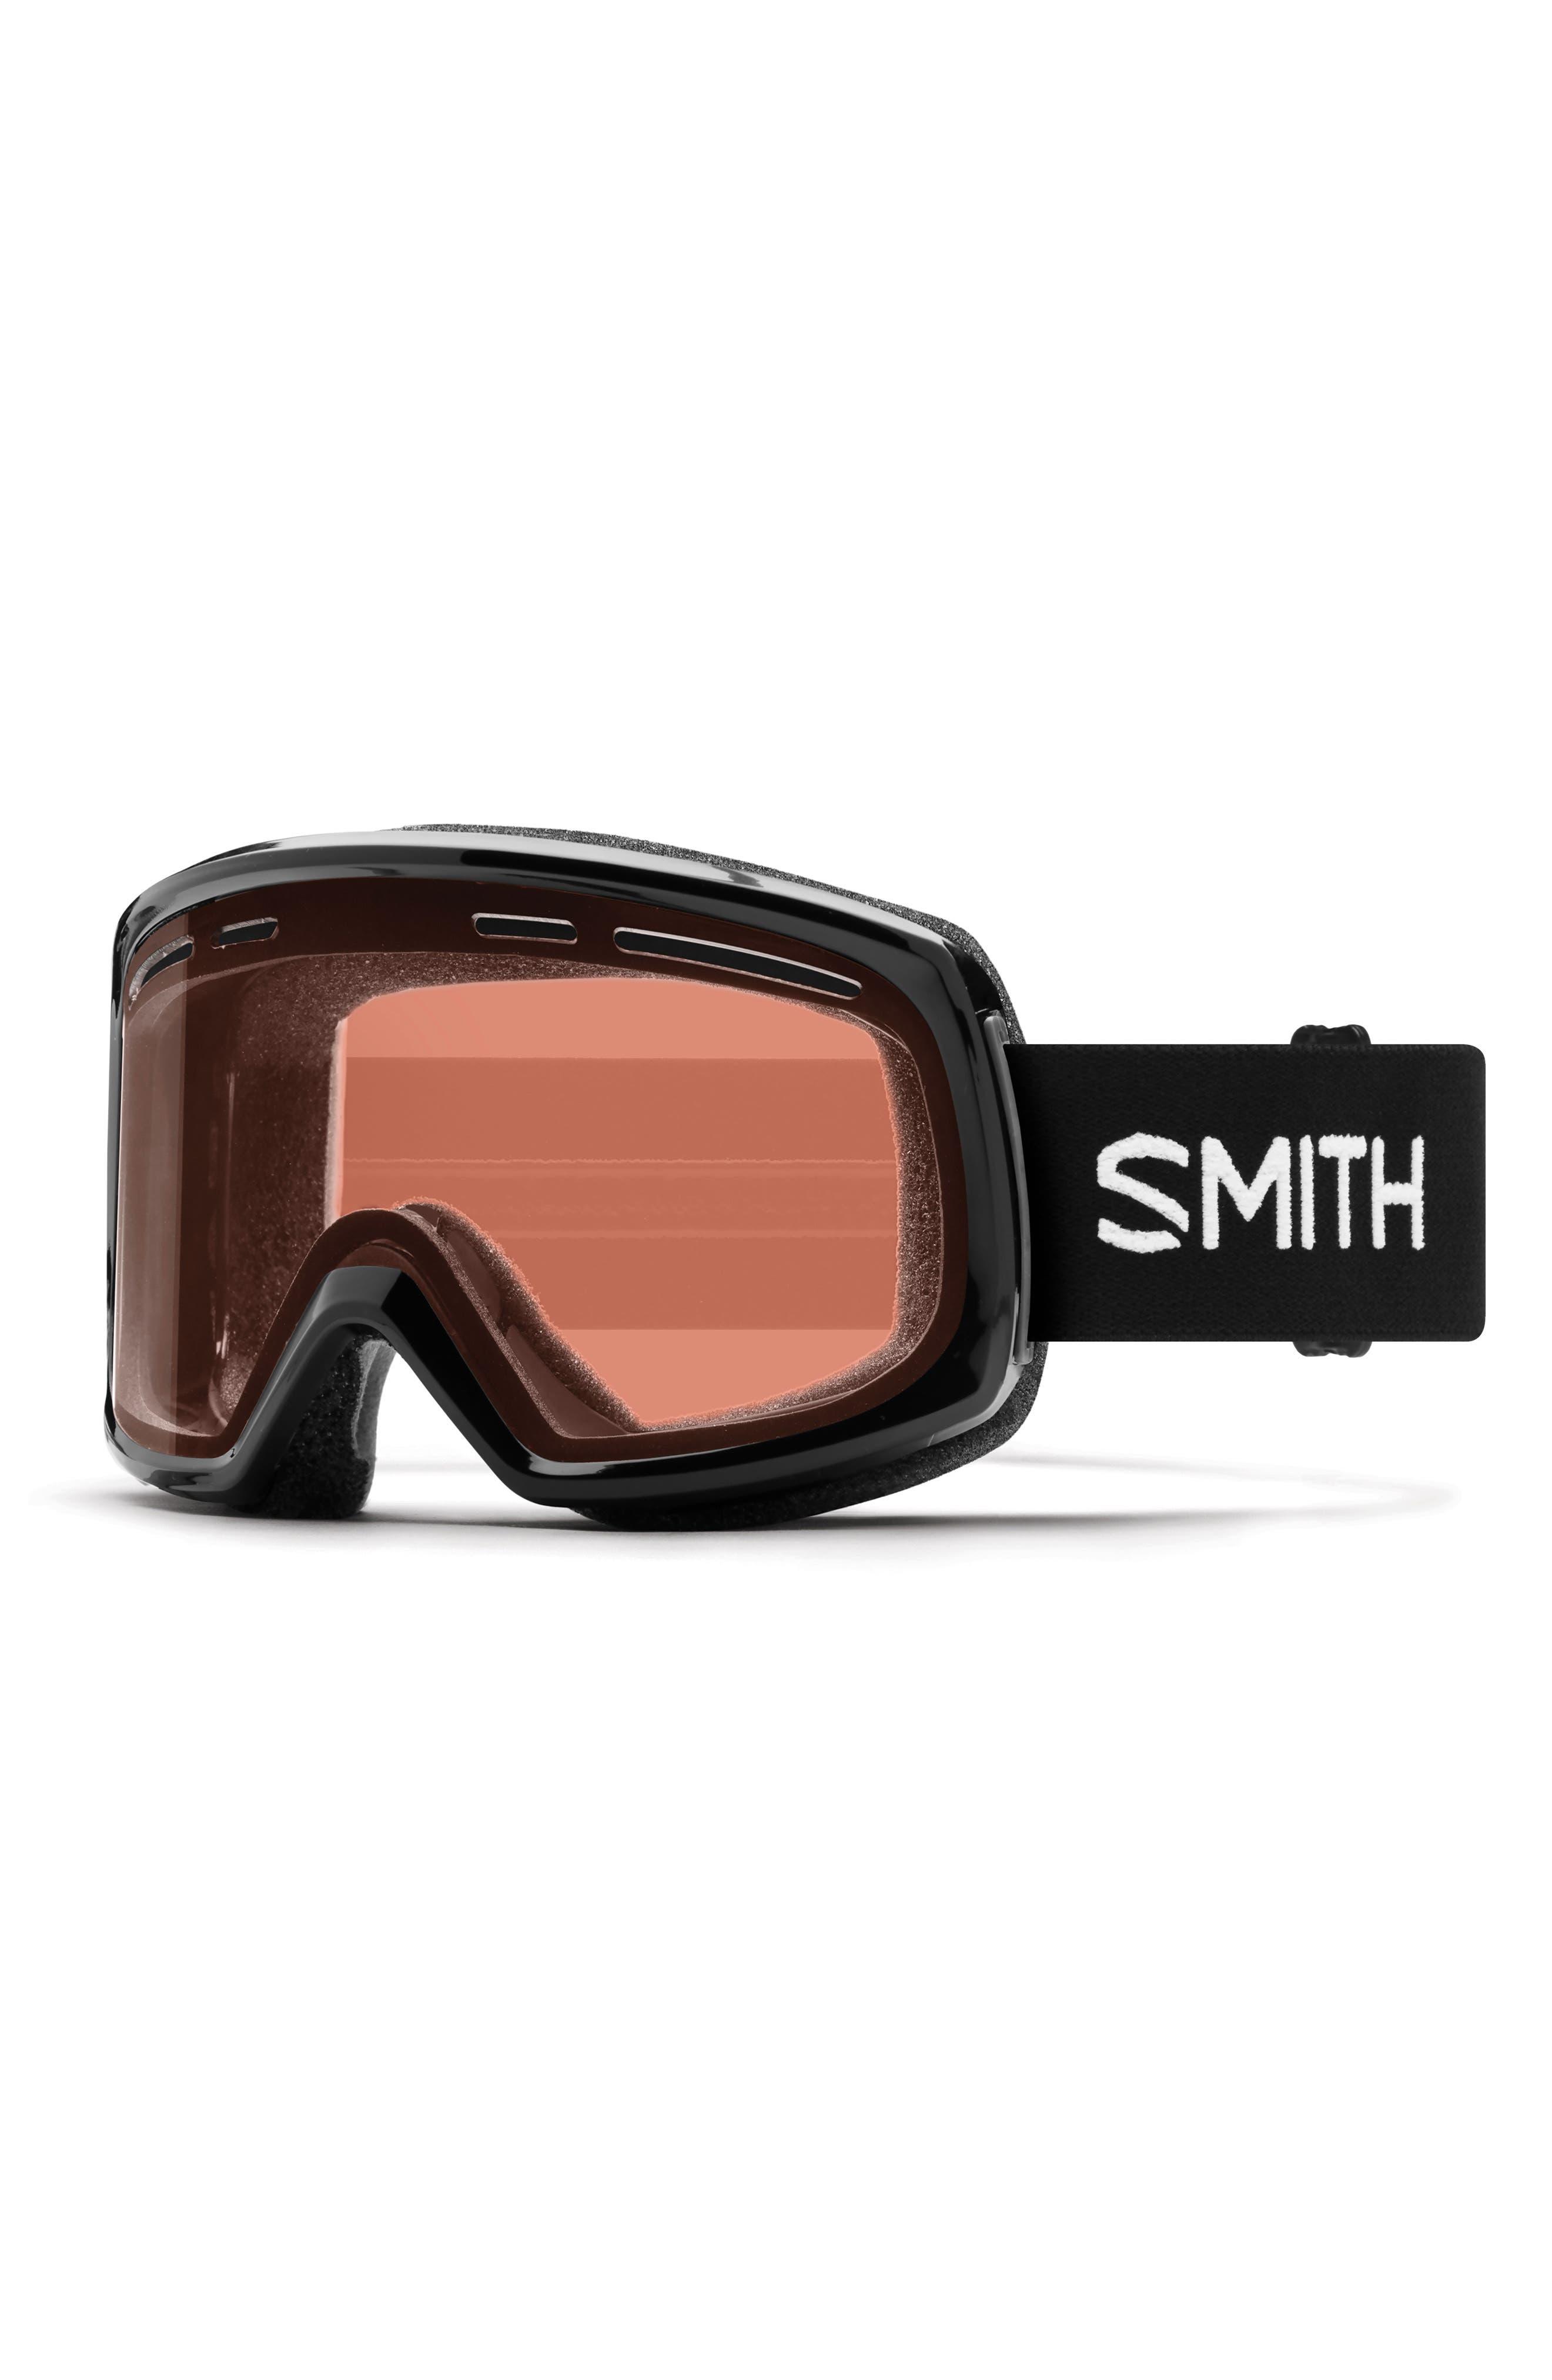 Range Snow Goggles,                             Main thumbnail 1, color,                             BLACK